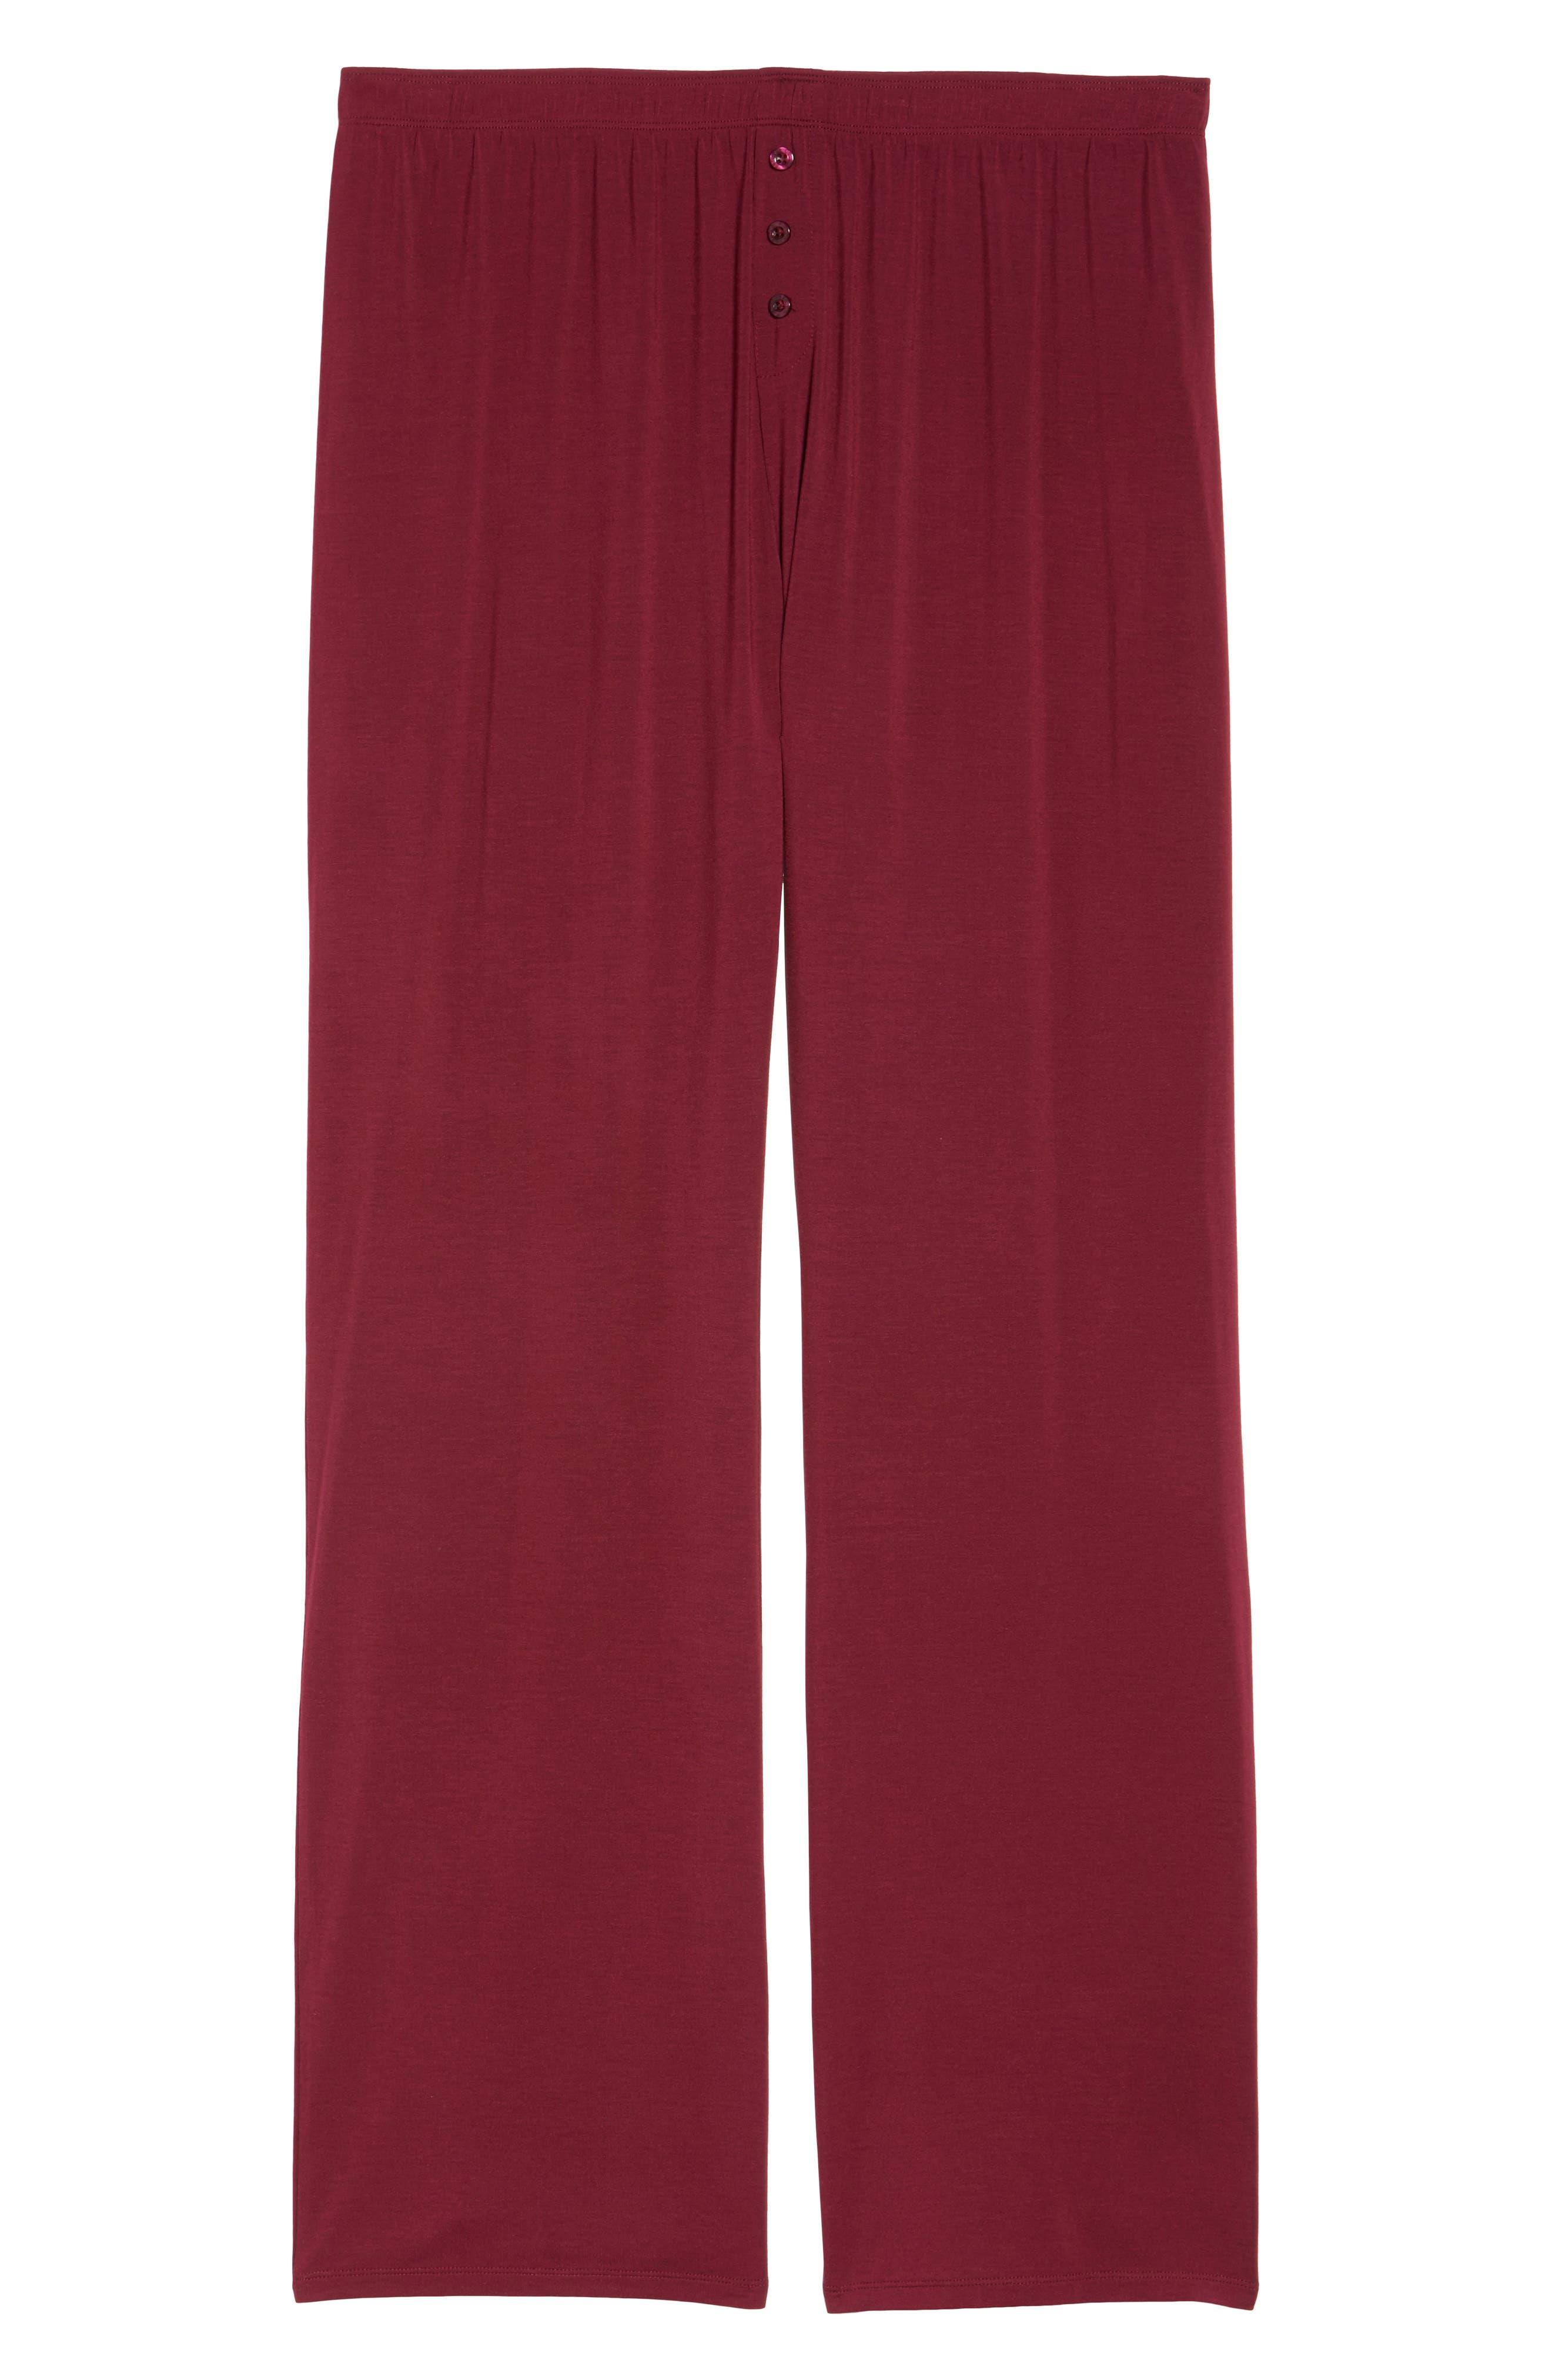 Lounge Pants,                             Alternate thumbnail 6, color,                             930